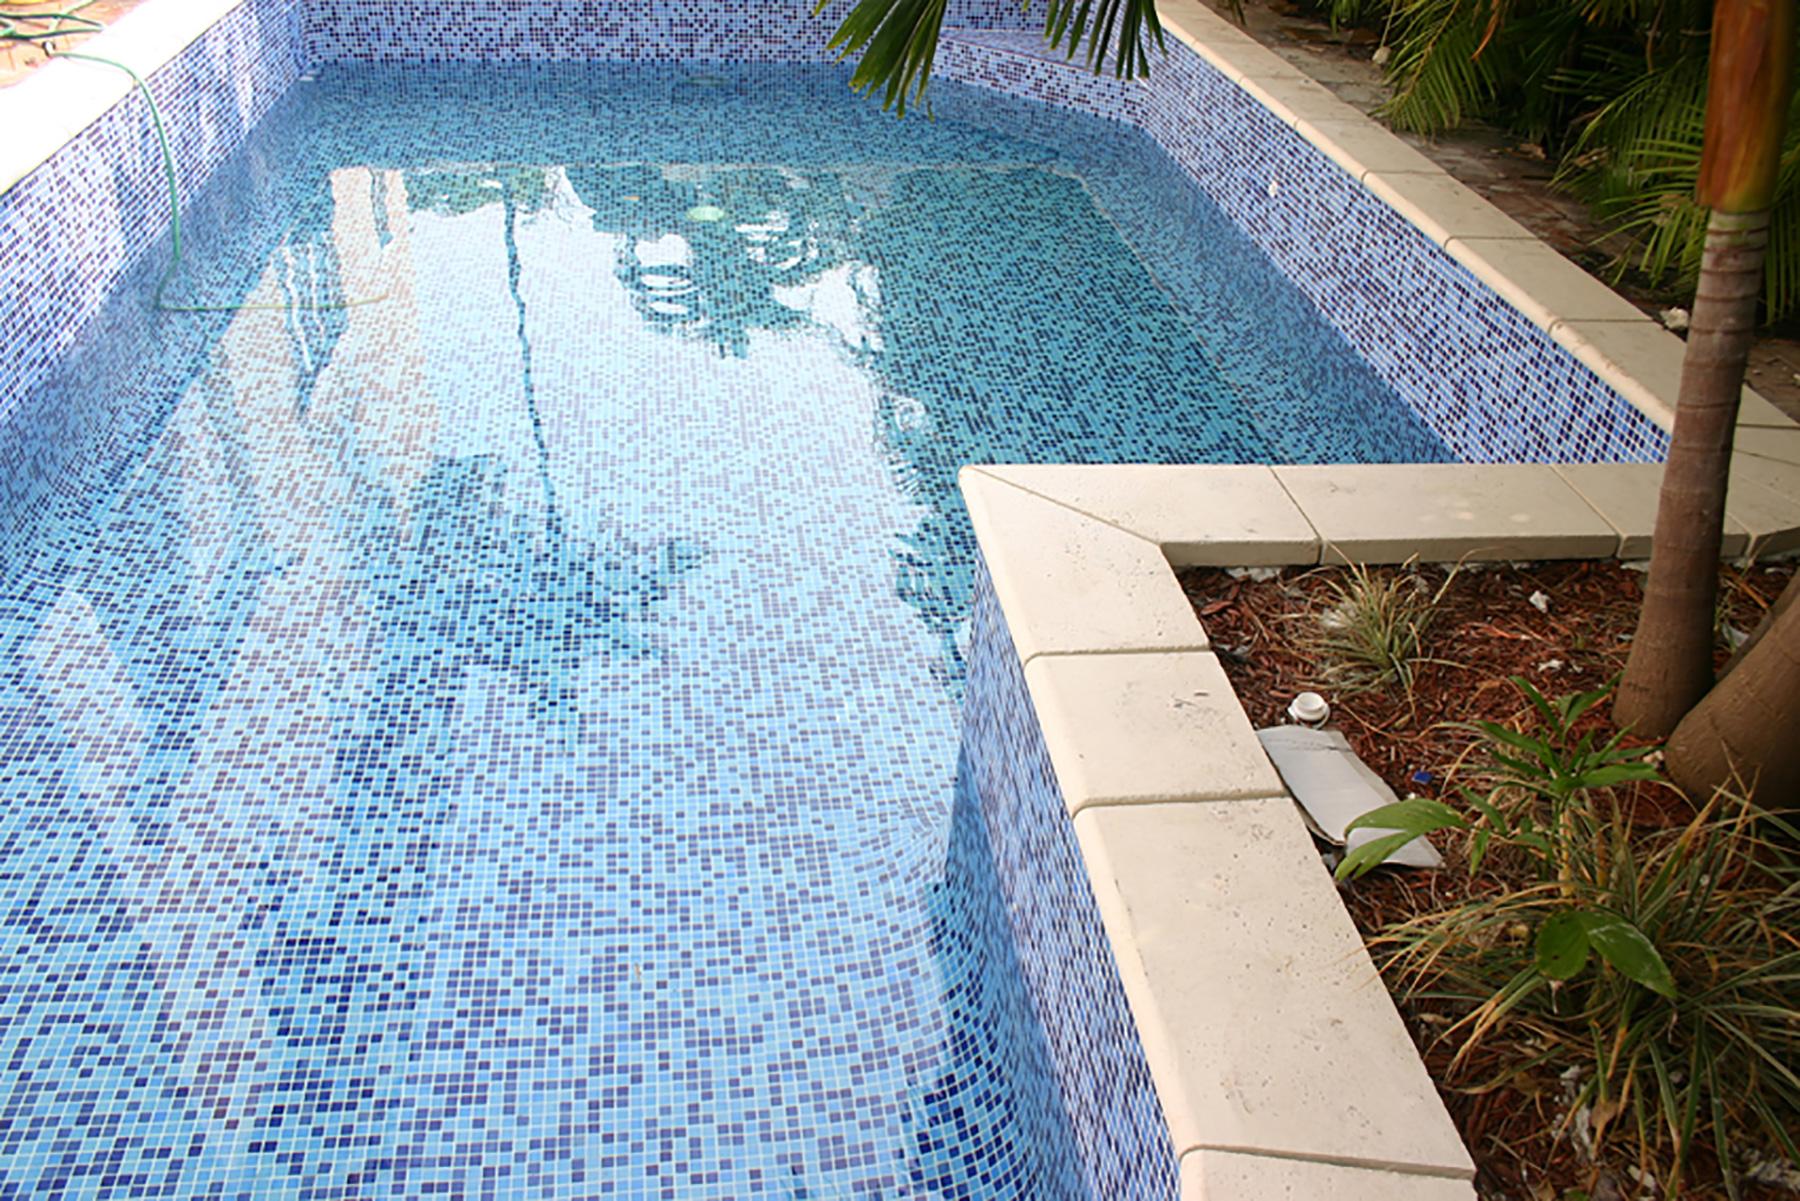 бассейн для дачи с мозаикой фото